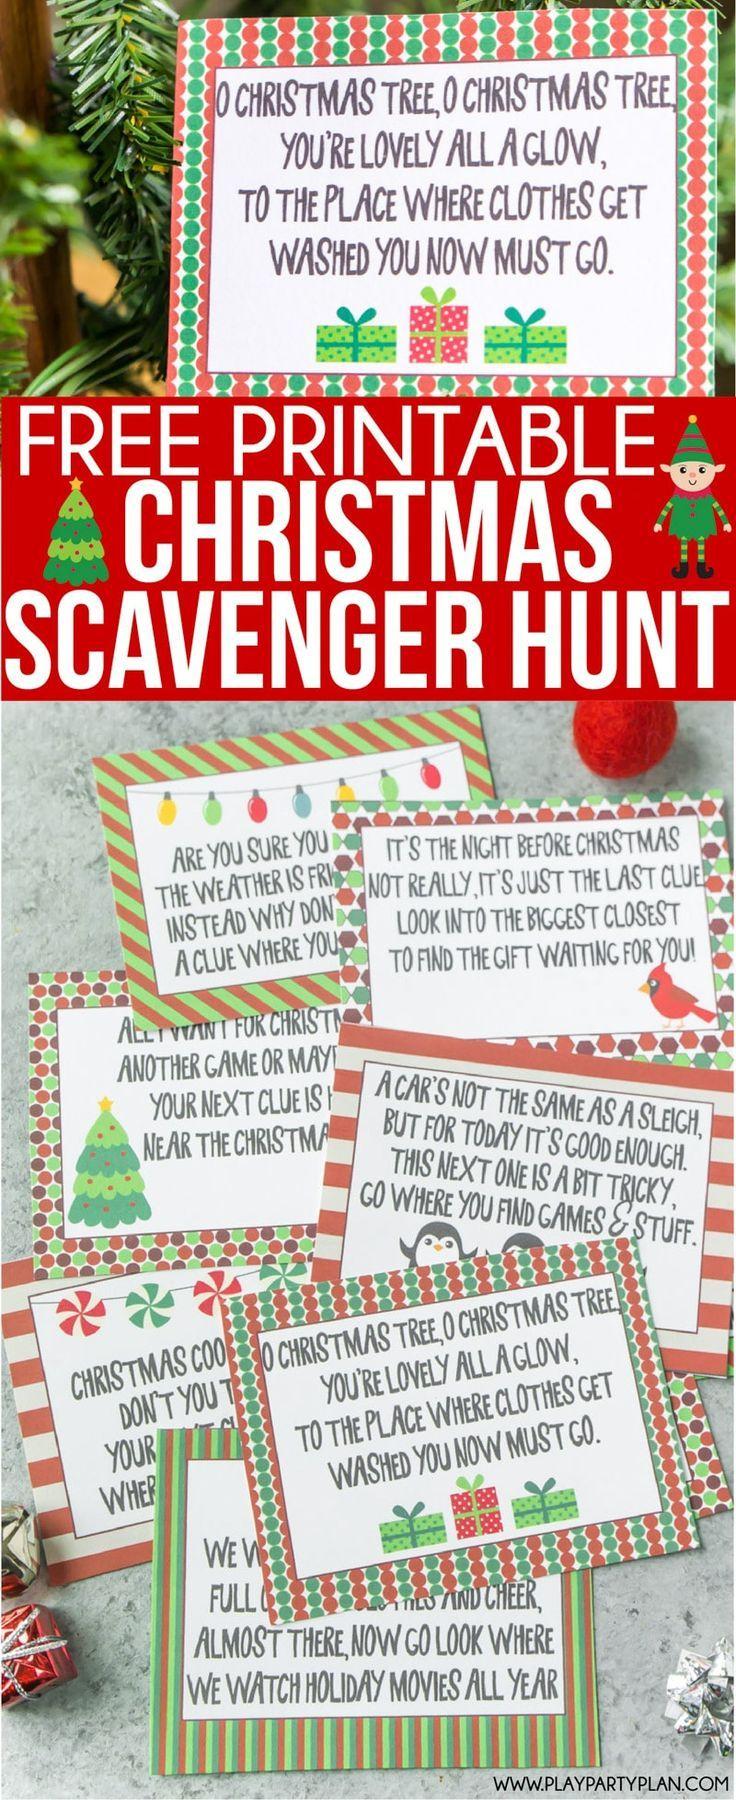 Free Printable Christmas Scavenger Hunt Clues For Kids Or For Teens - Free Printable Christmas Treasure Hunt Clues